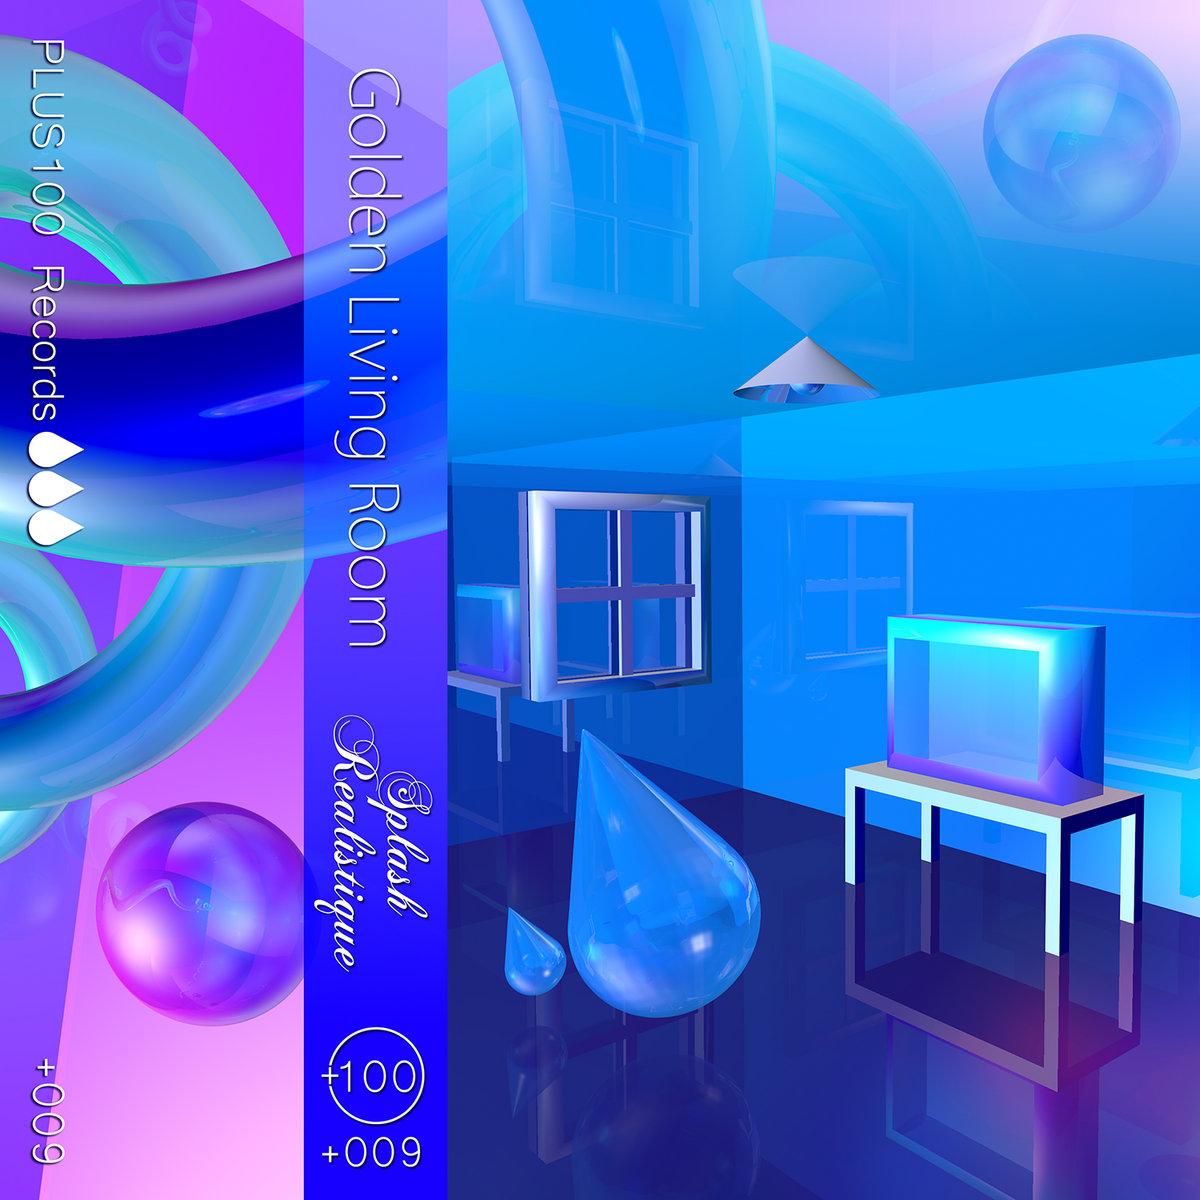 Splash Realistique PLUS Records - Golden living room